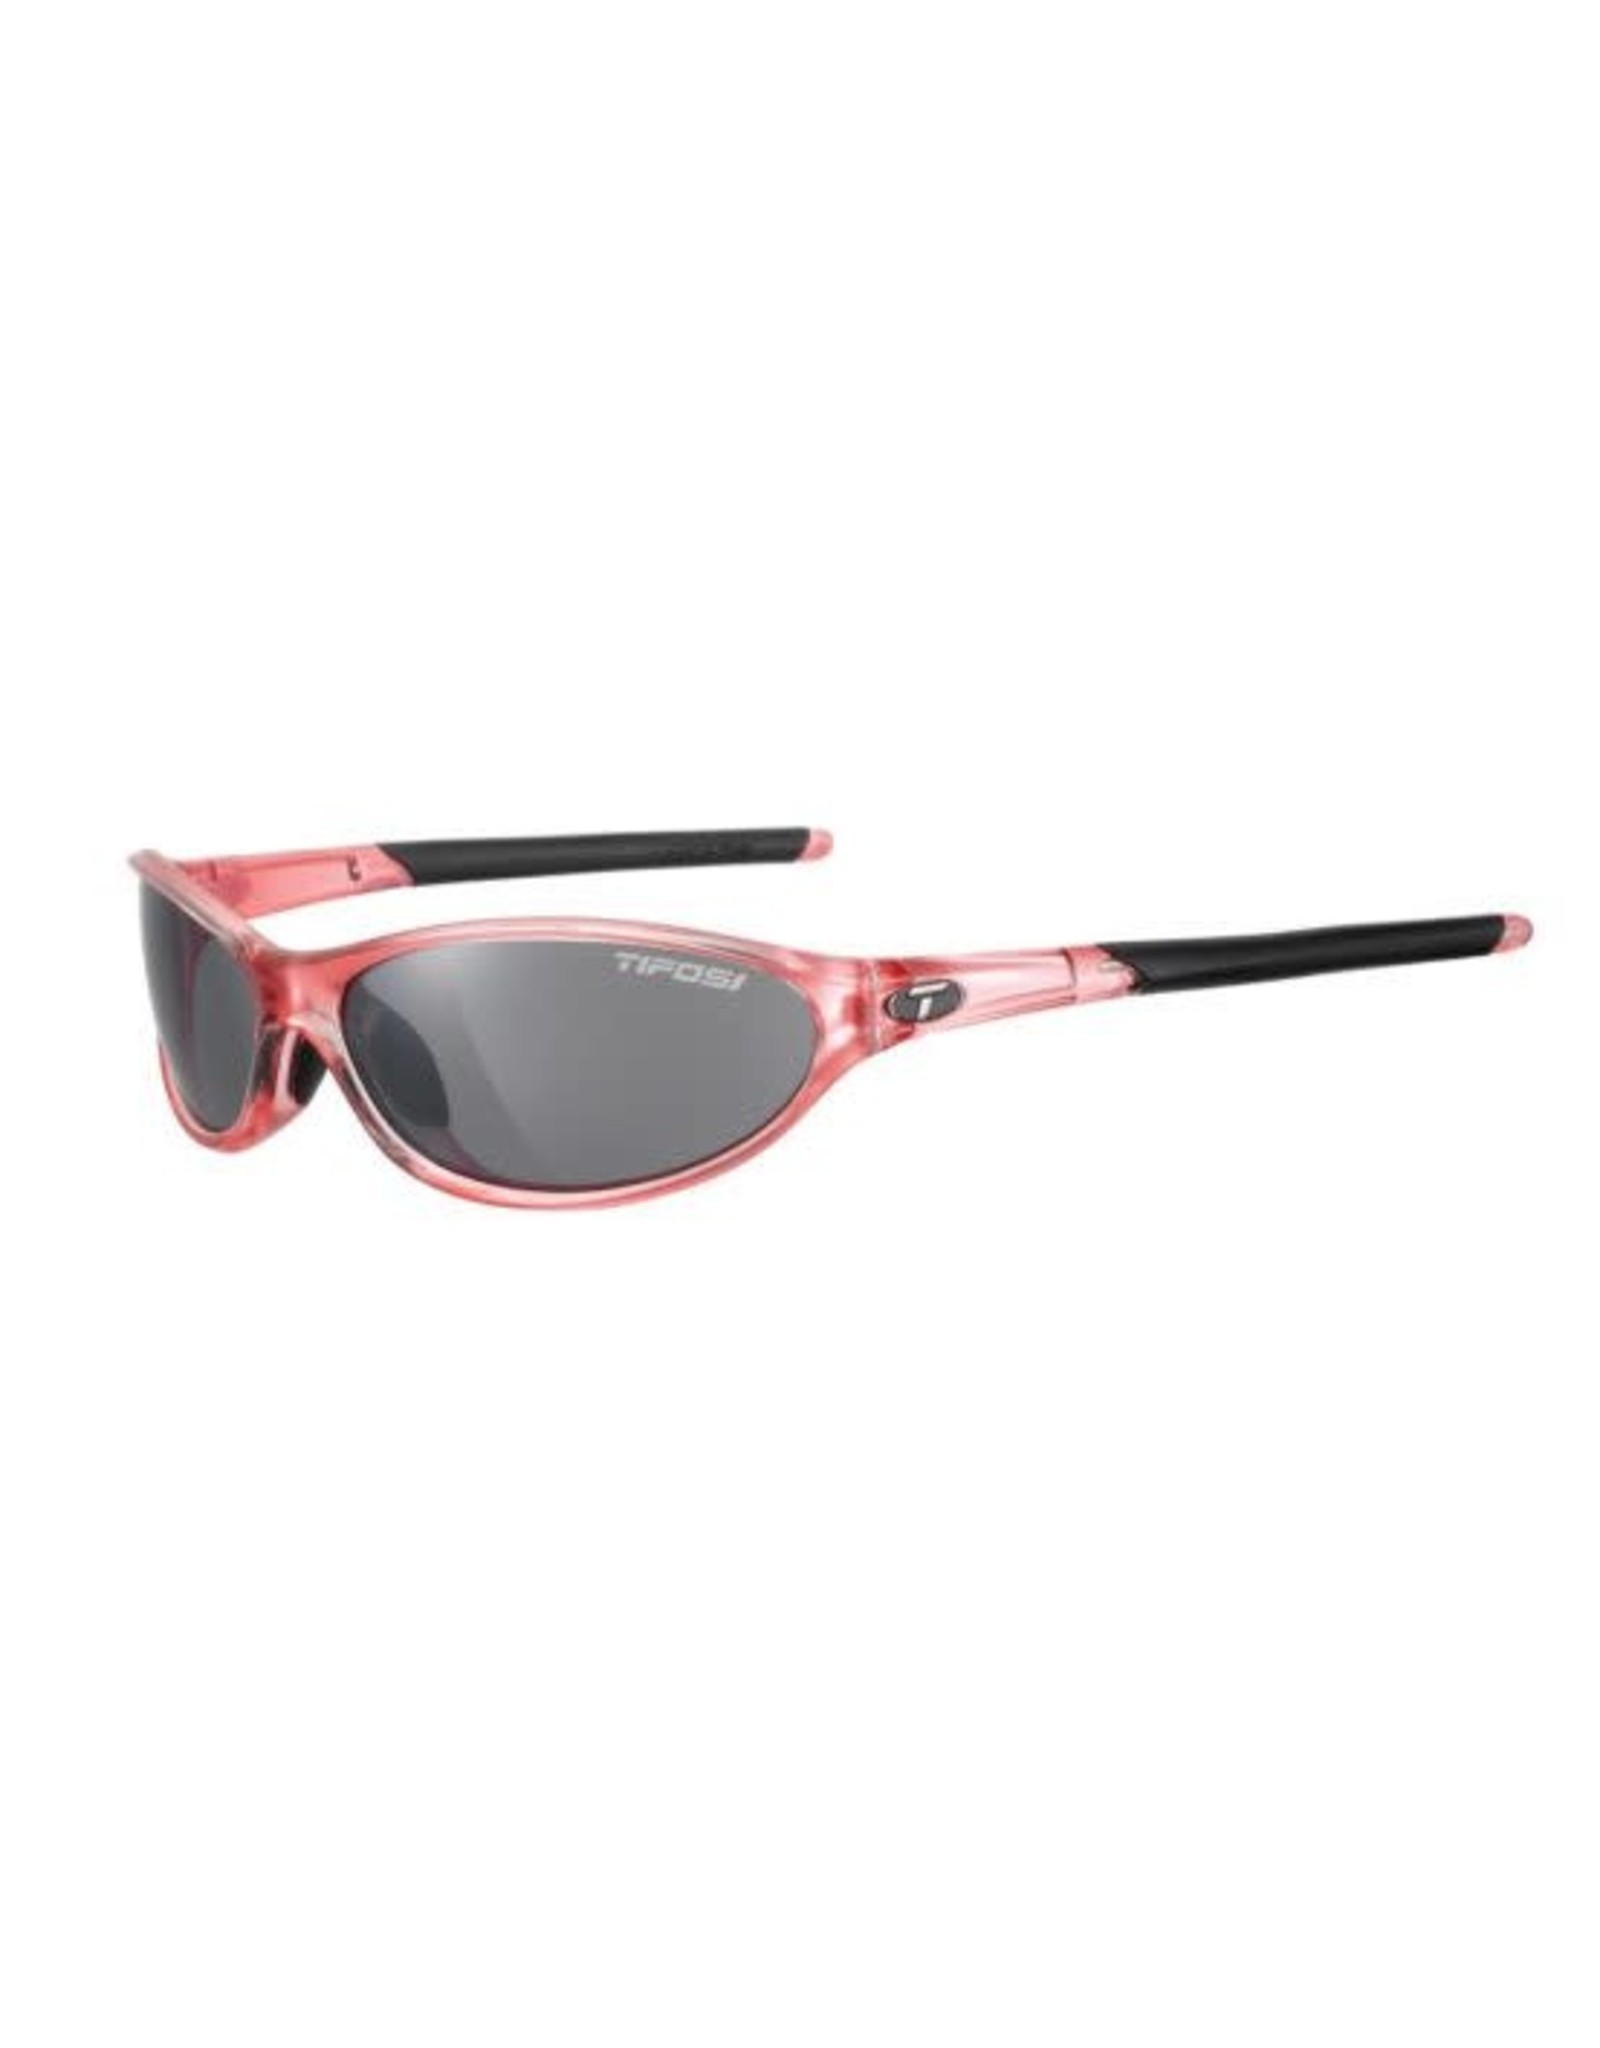 Tifosi Alpe 2.0 Sunglasses